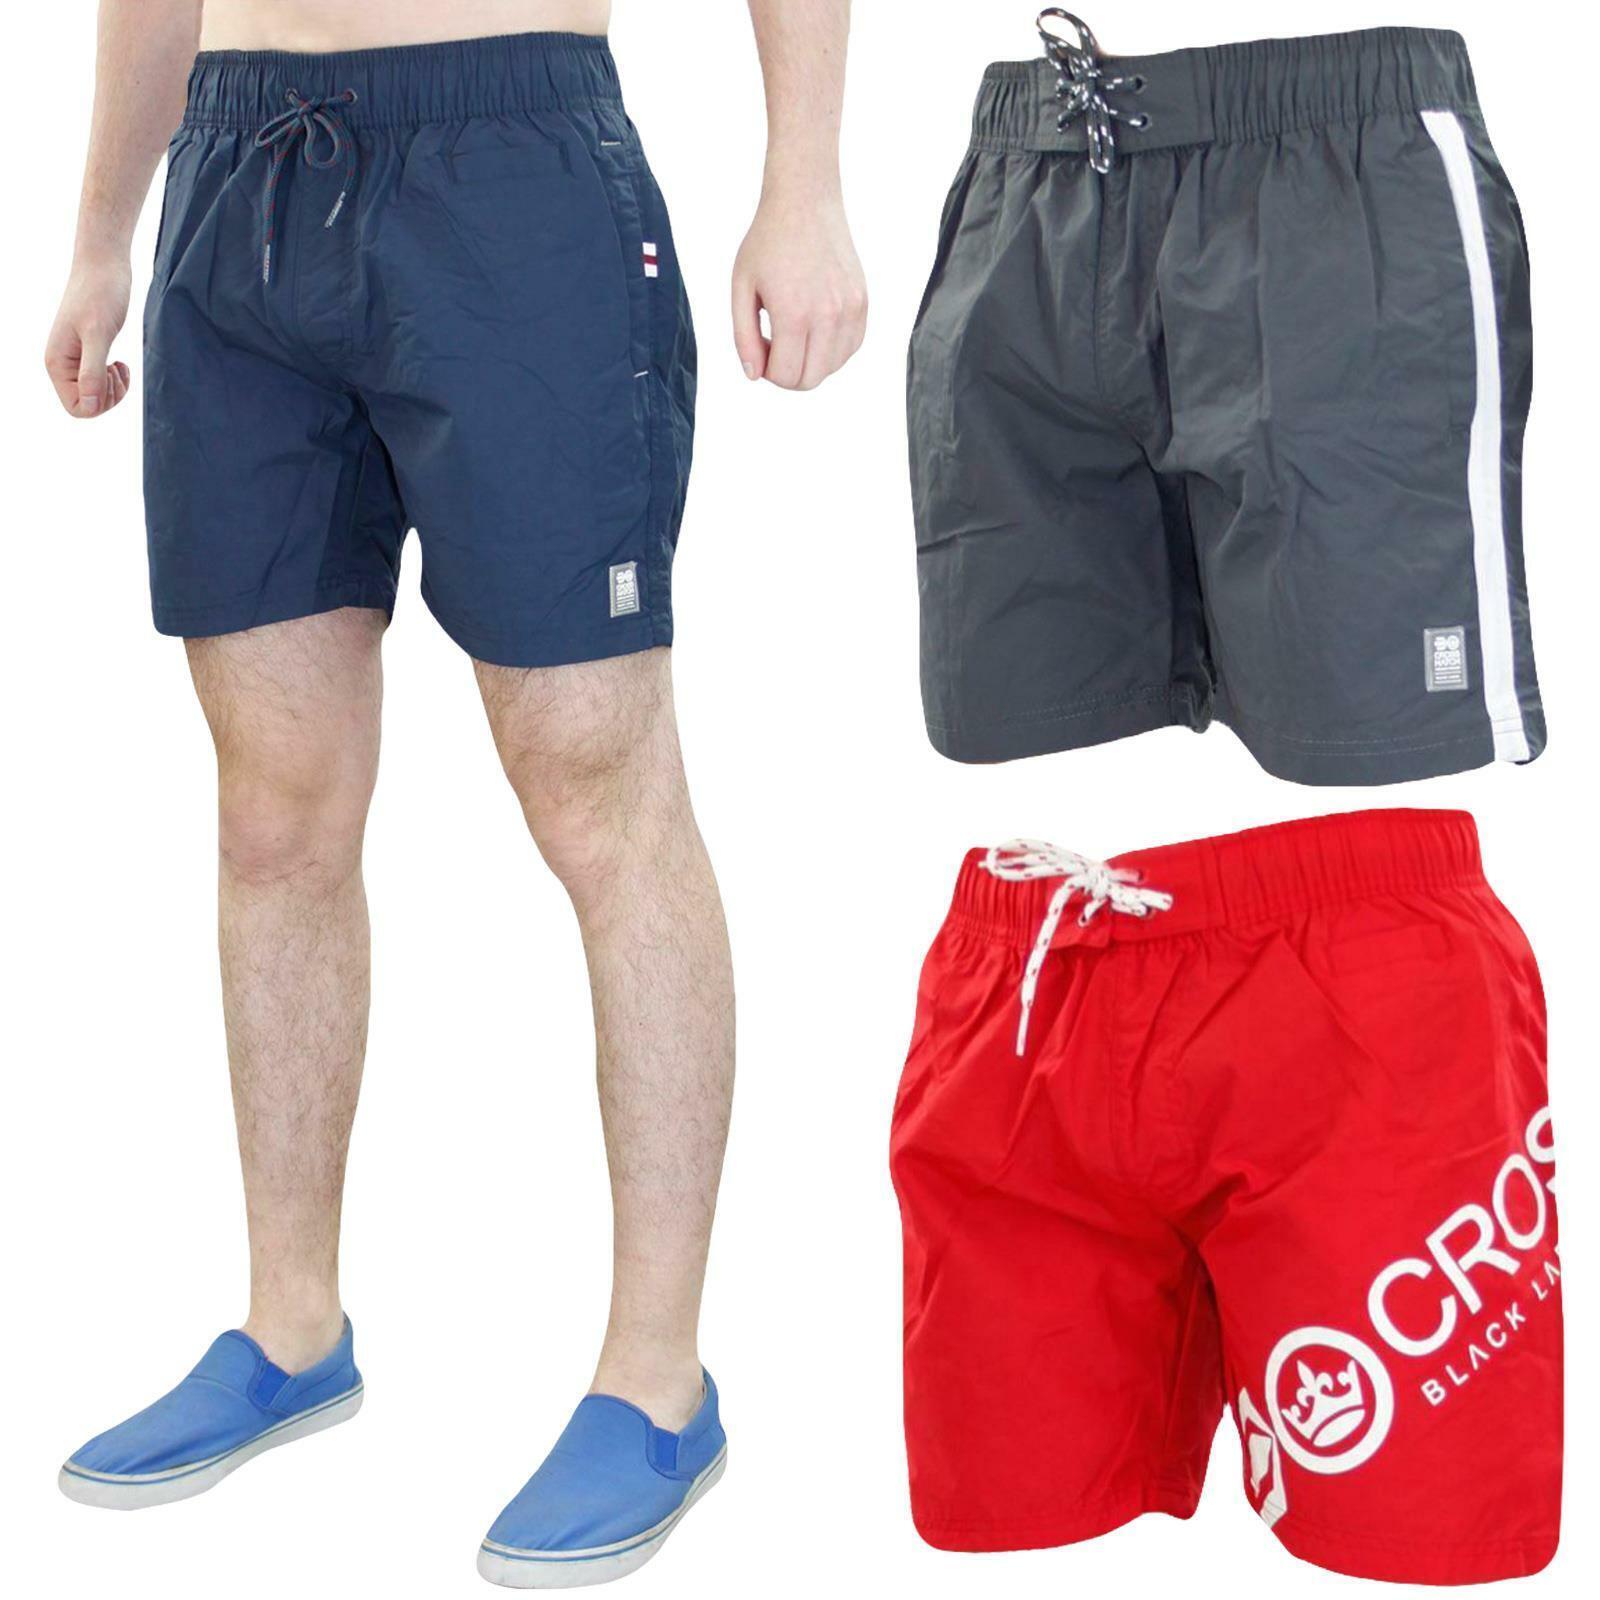 Crosshatch Mens Swim Shorts Mesh Line Summer Beach Swimwear Trunks Sizes S - 2XL